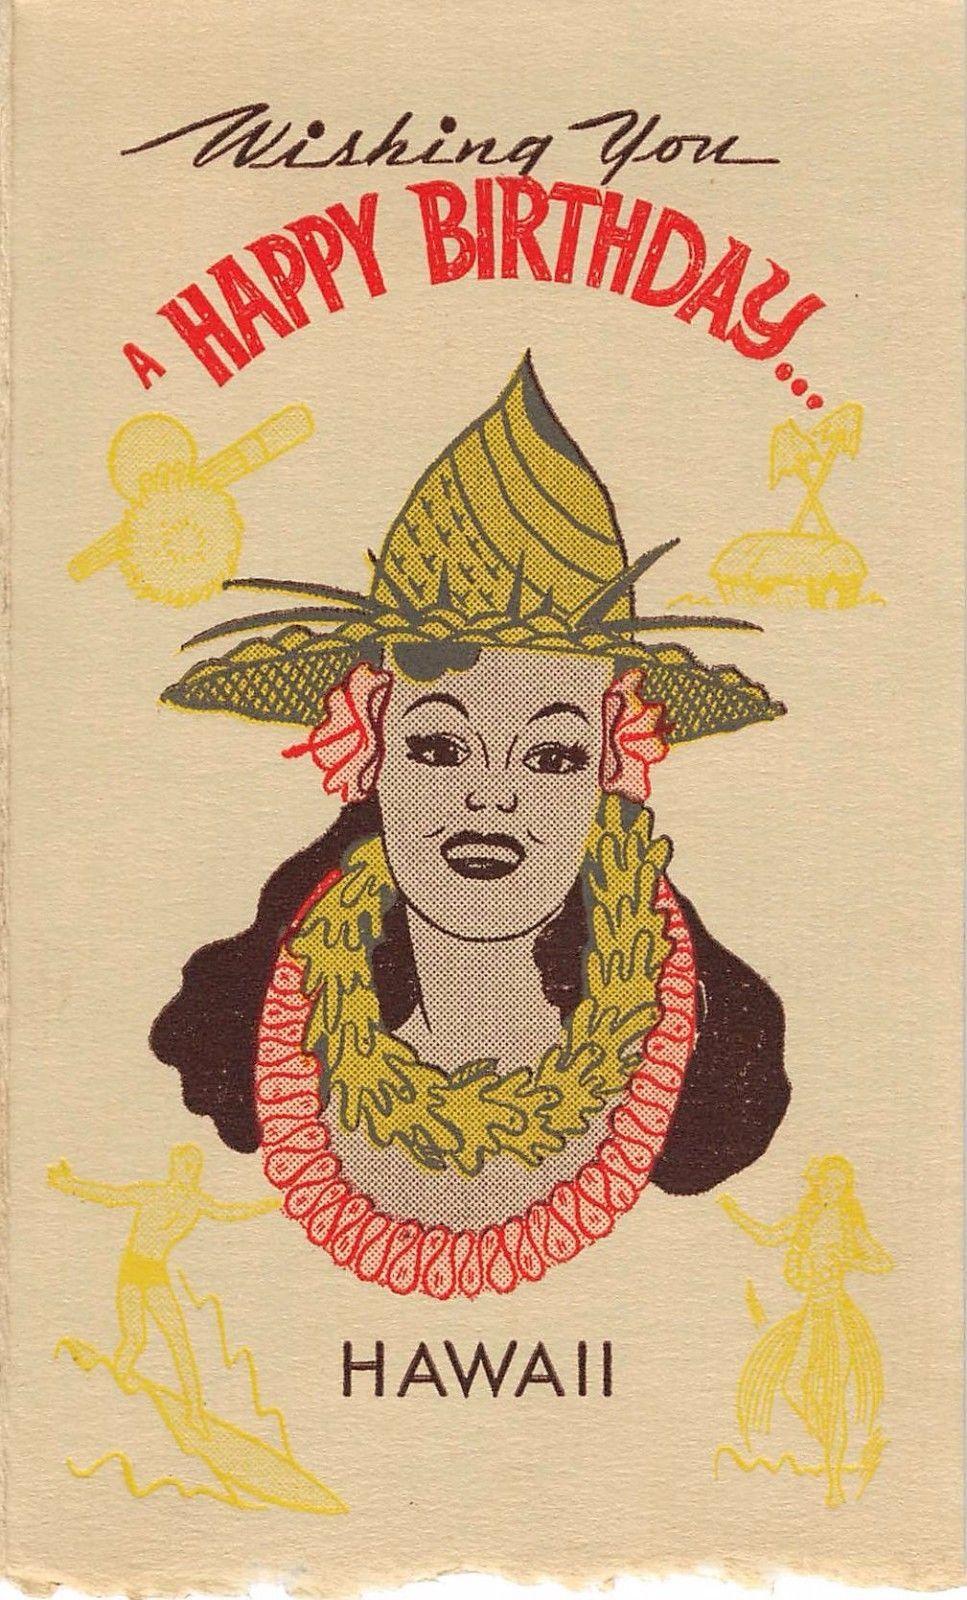 Hawaiian hula girl vintage wwii graphic art birthday greetings card wwii birthday card with hula girl image kristyandbryce Gallery